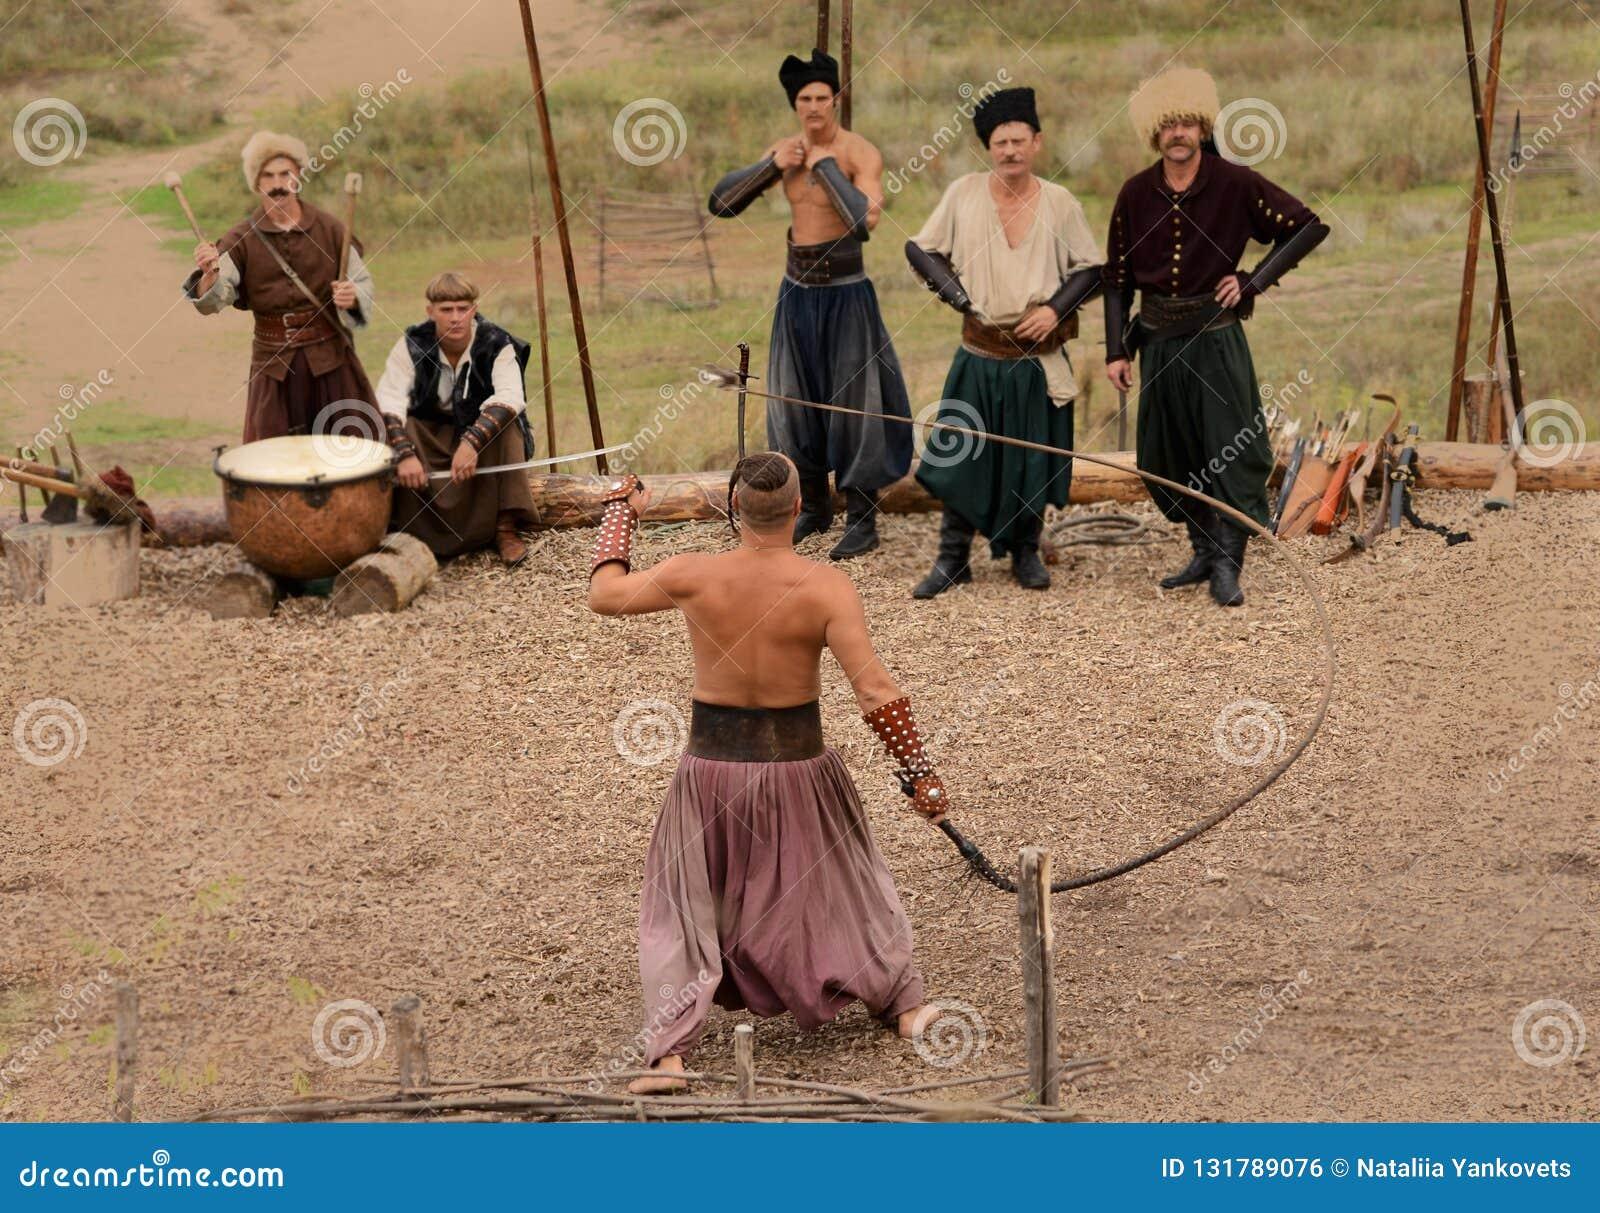 Ukrainian traditional festival in Zaporozhye on the Khortitsa island October 1, 2013